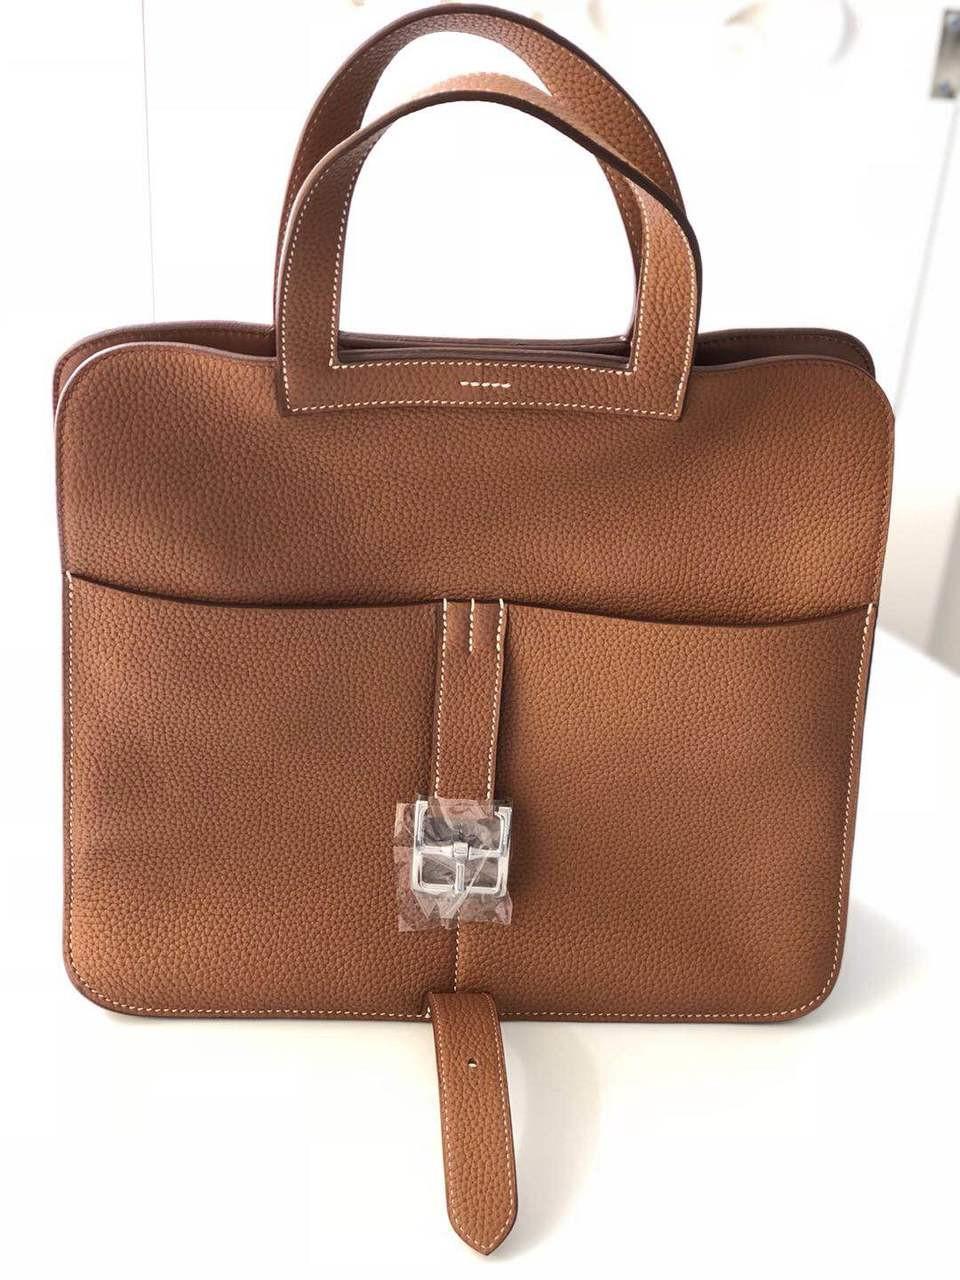 3087966d6af5 Hermes Gold 31 cm Halzan bag Togo Leather - Bella Vita Moda